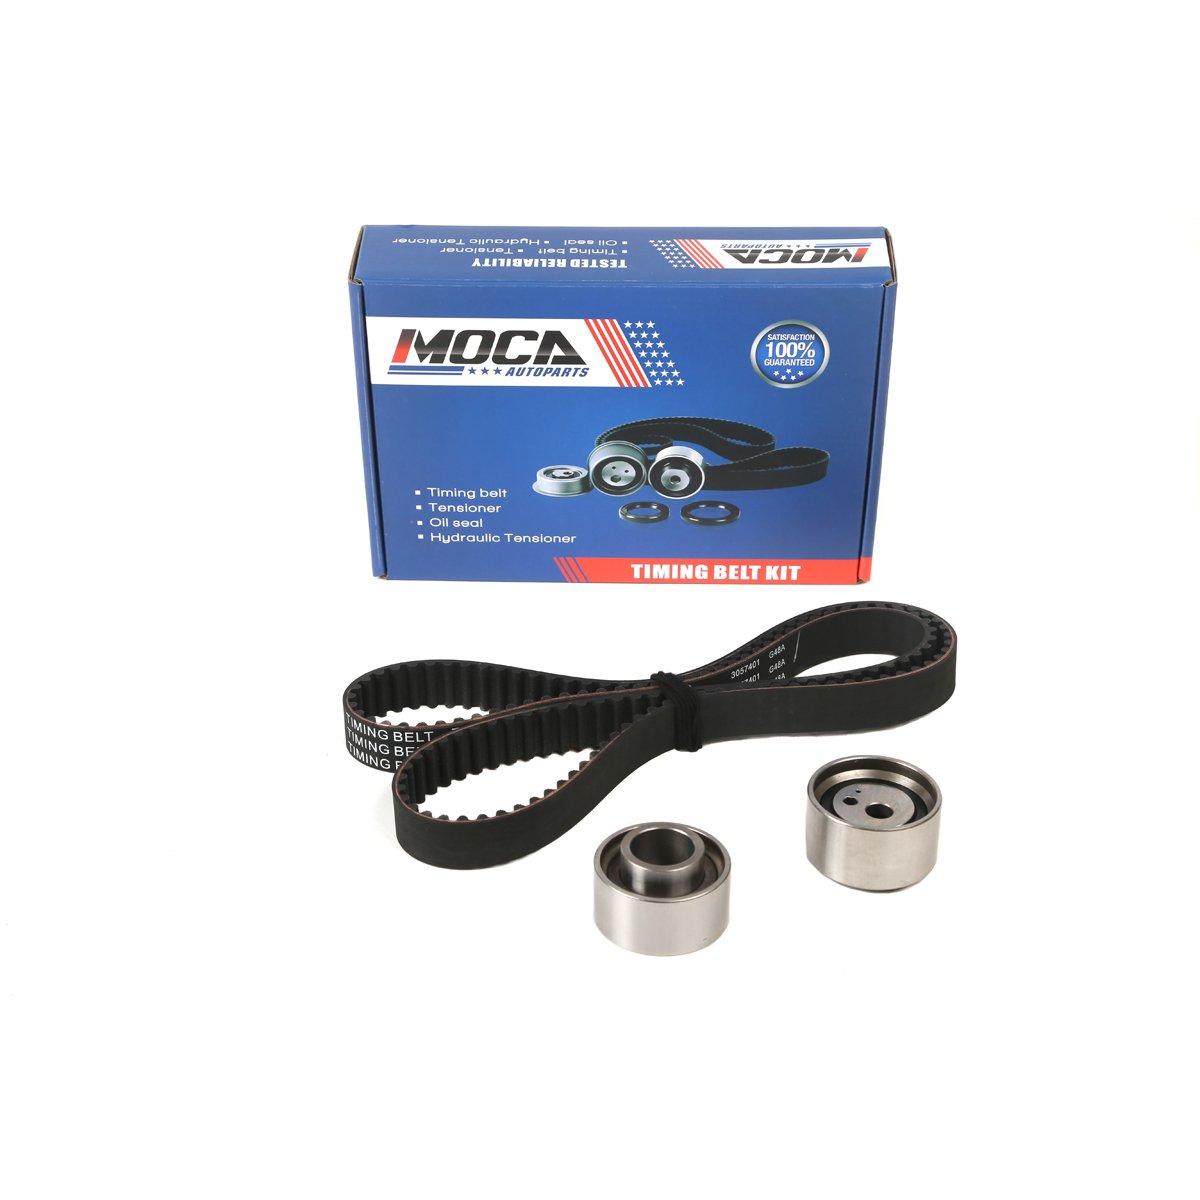 Moca Timing Belt Kit With Tensioner Fit 98 04 Kia Spectra 01 1999 Sportage Sephia